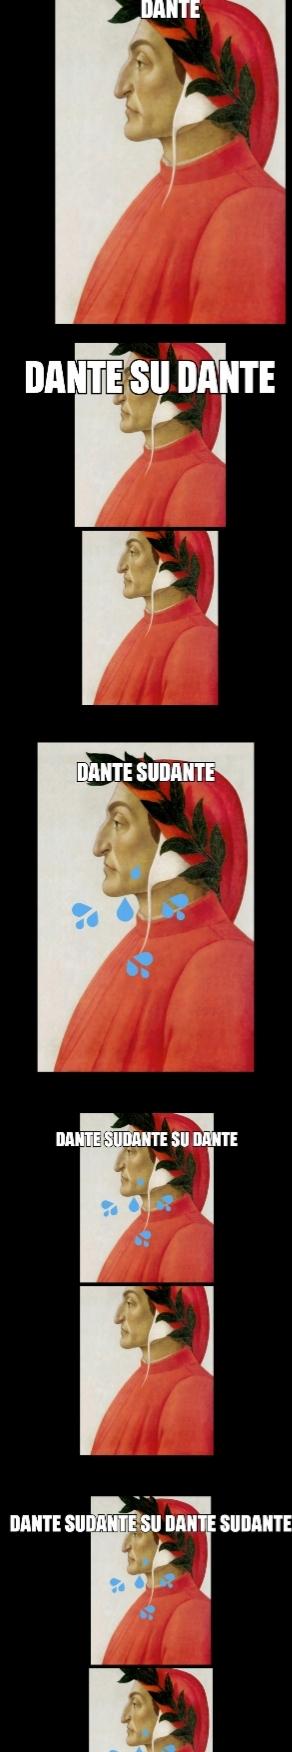 Dante - meme